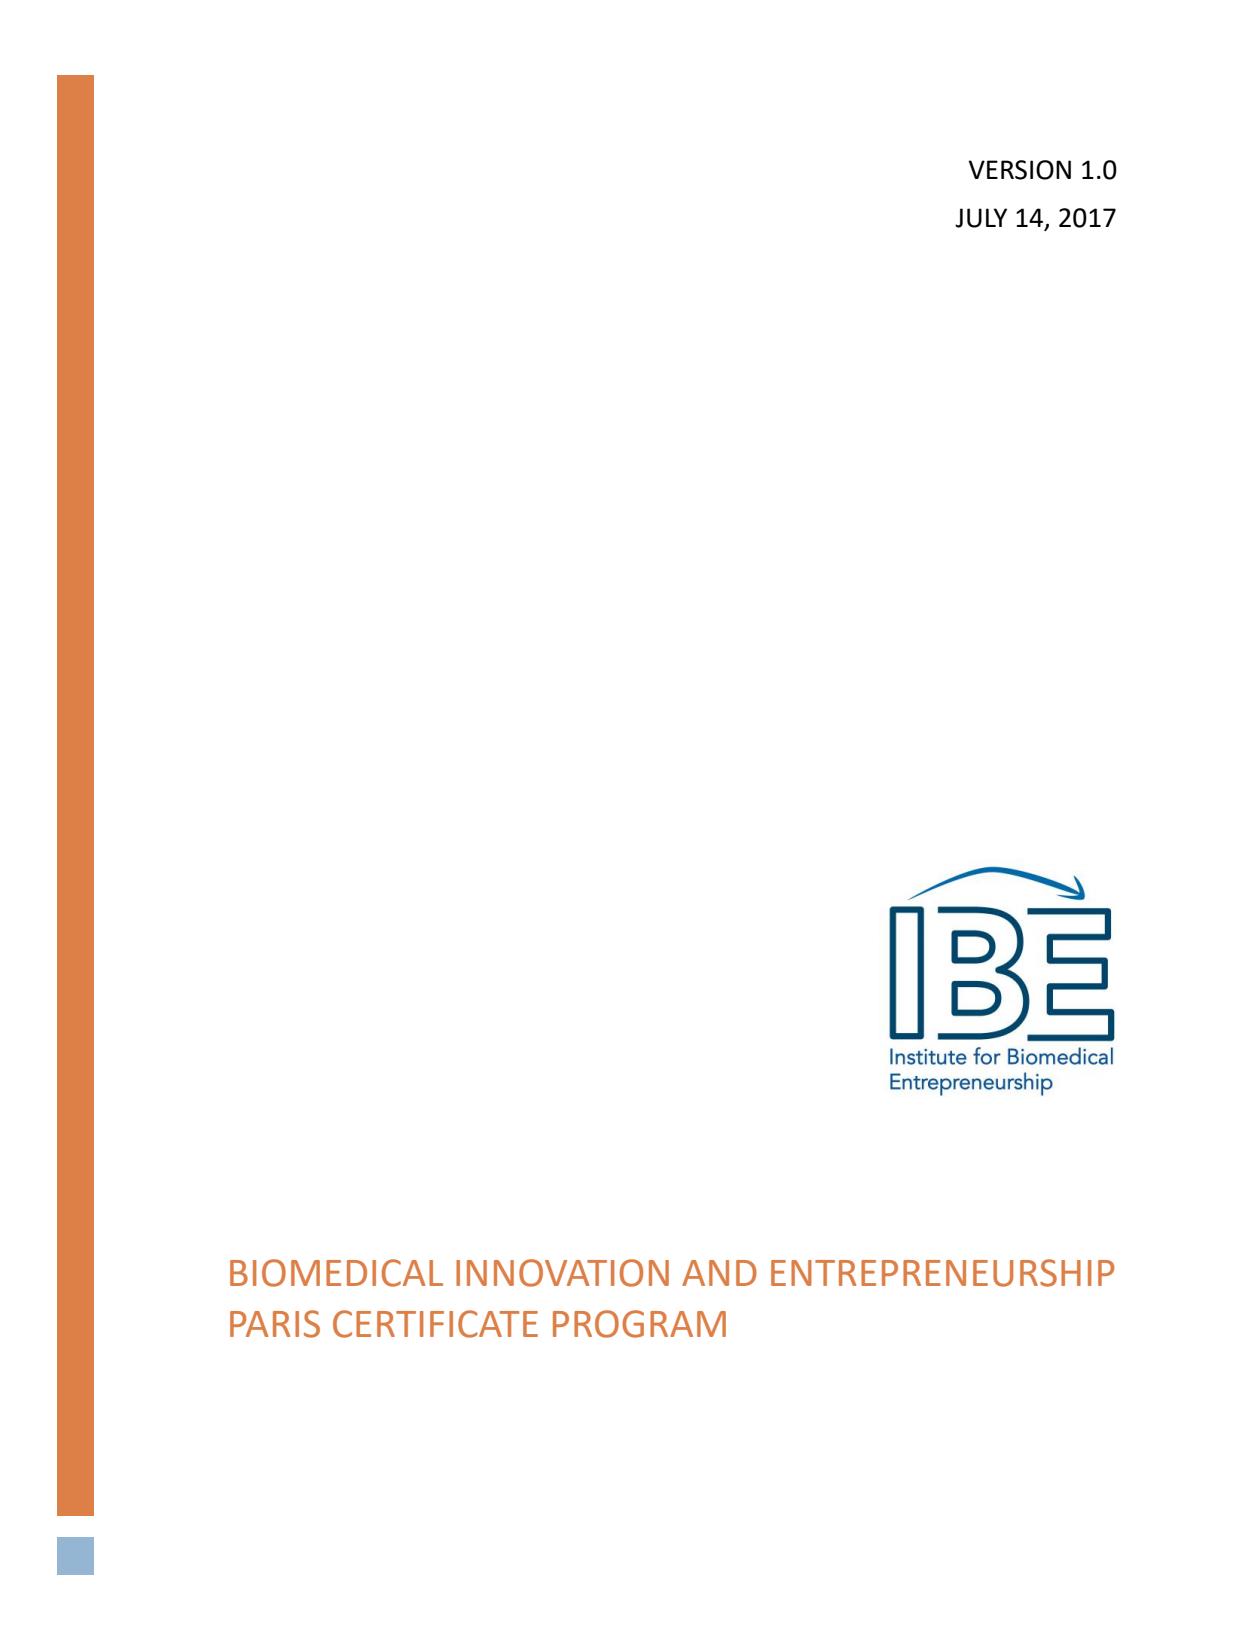 Ibe Paris Course Information